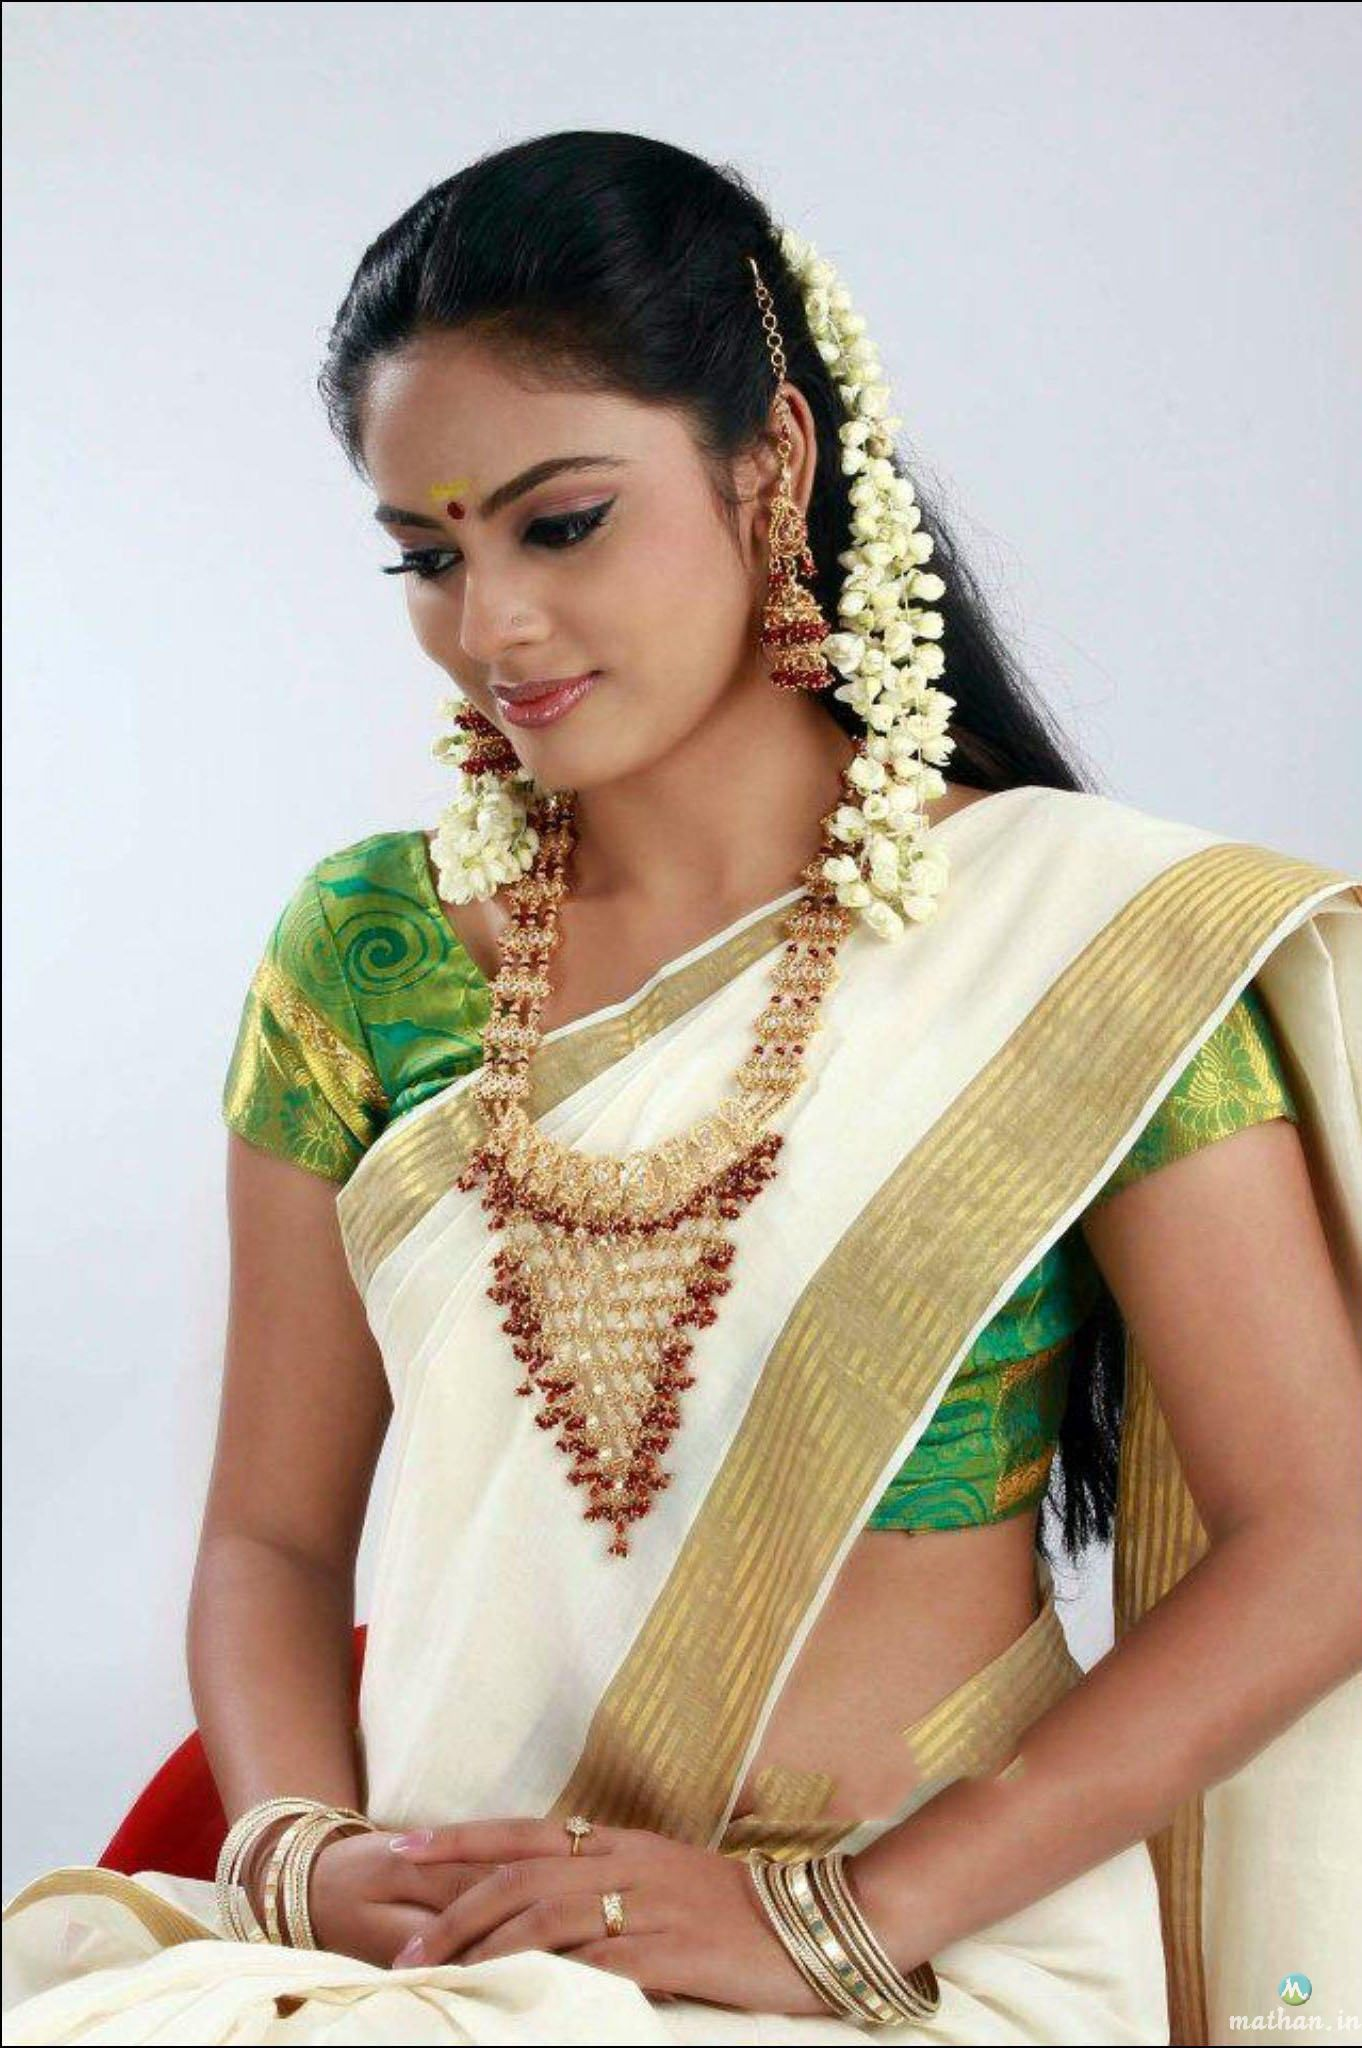 Nanditha Photoshoot HD | saree | Pinterest | Photoshoot, Saree and ...